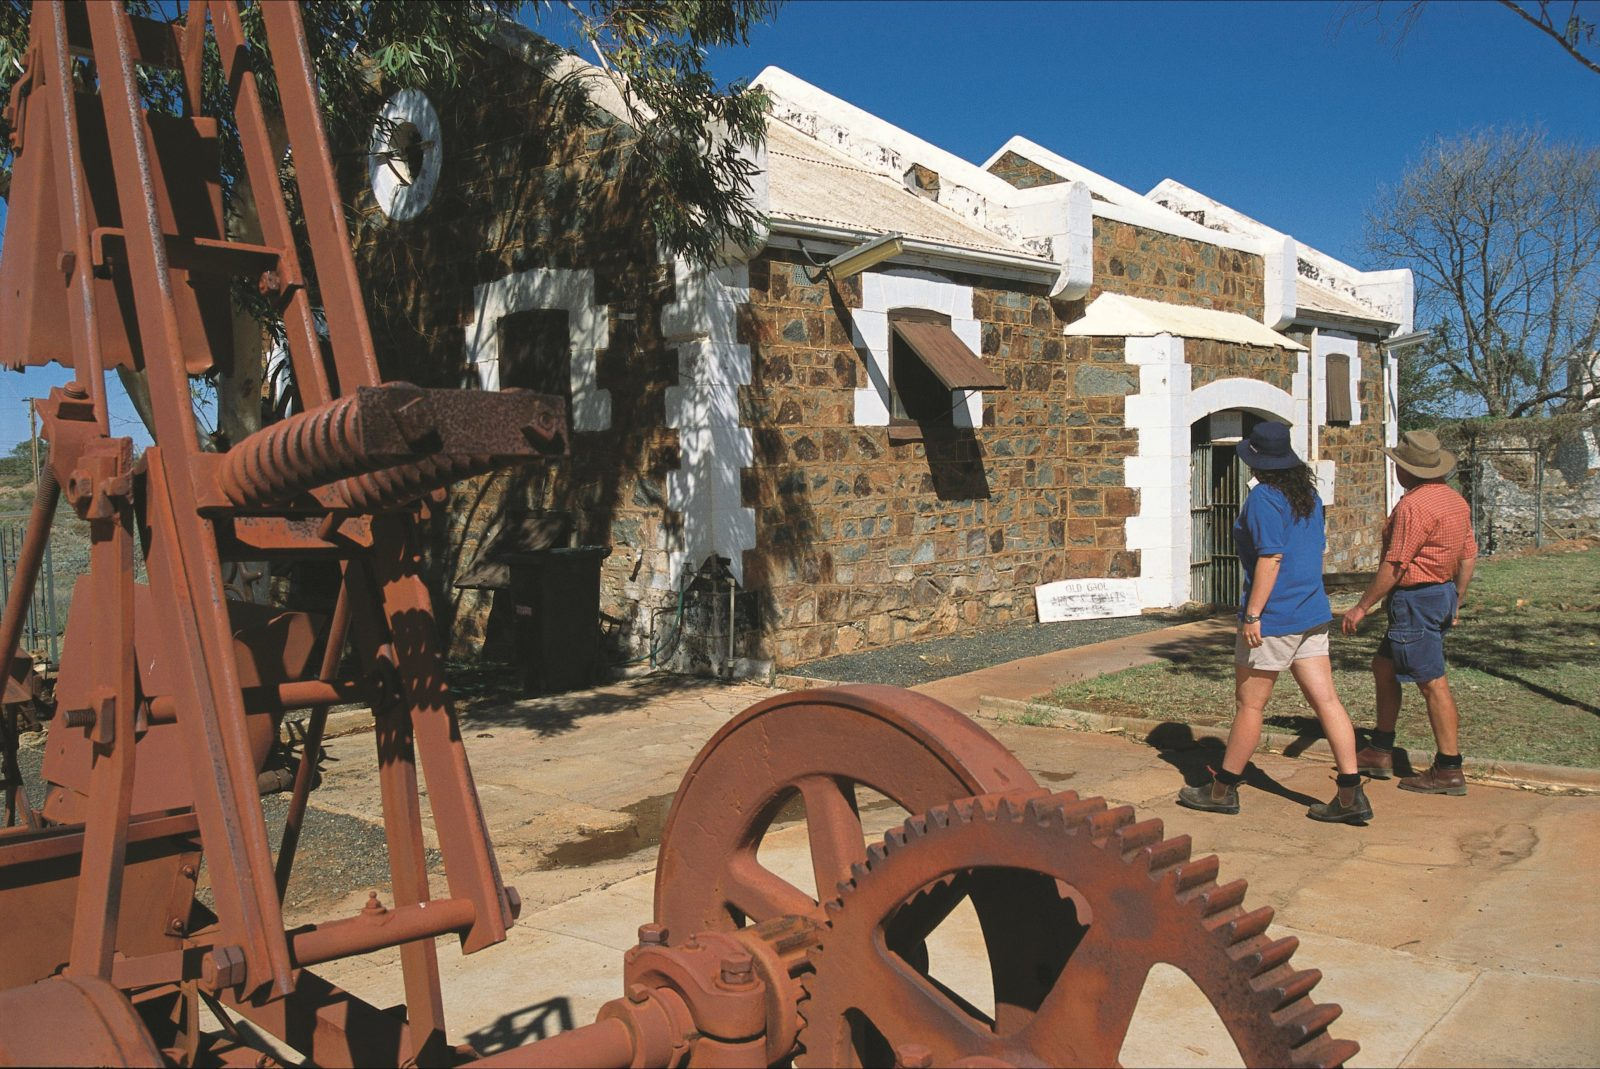 Roebourne Old Gaol Museum, Roebourne, Western Australia